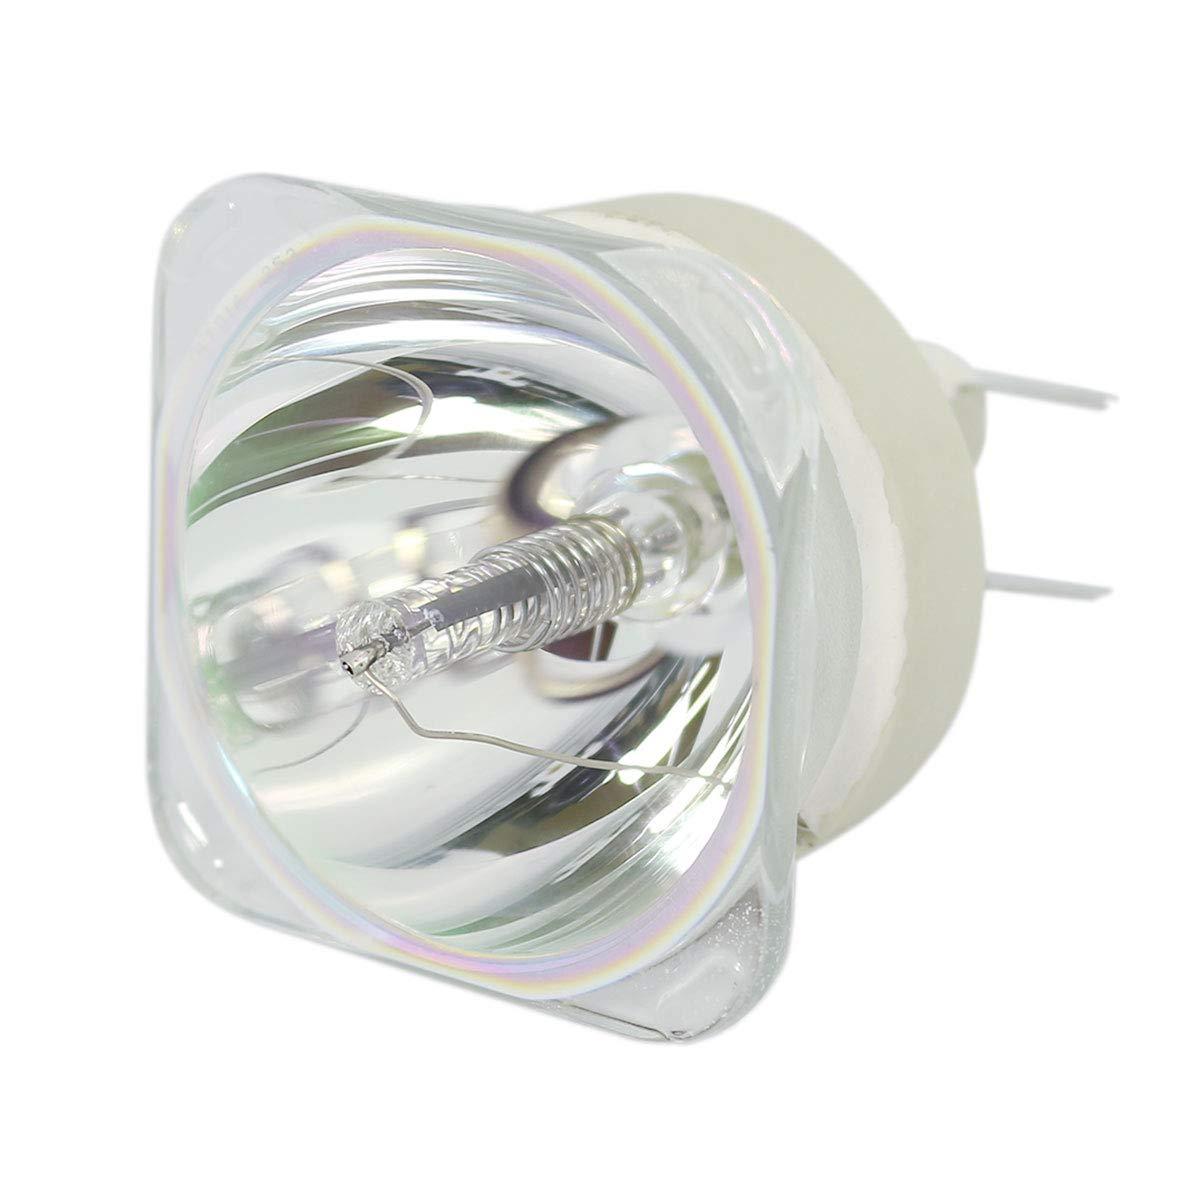 Lutema OEM プロジェクター交換用ランプ ハウジング/電球付き BenQ MW769用 Economy B07KTL5NF2 Lamp Only Economy